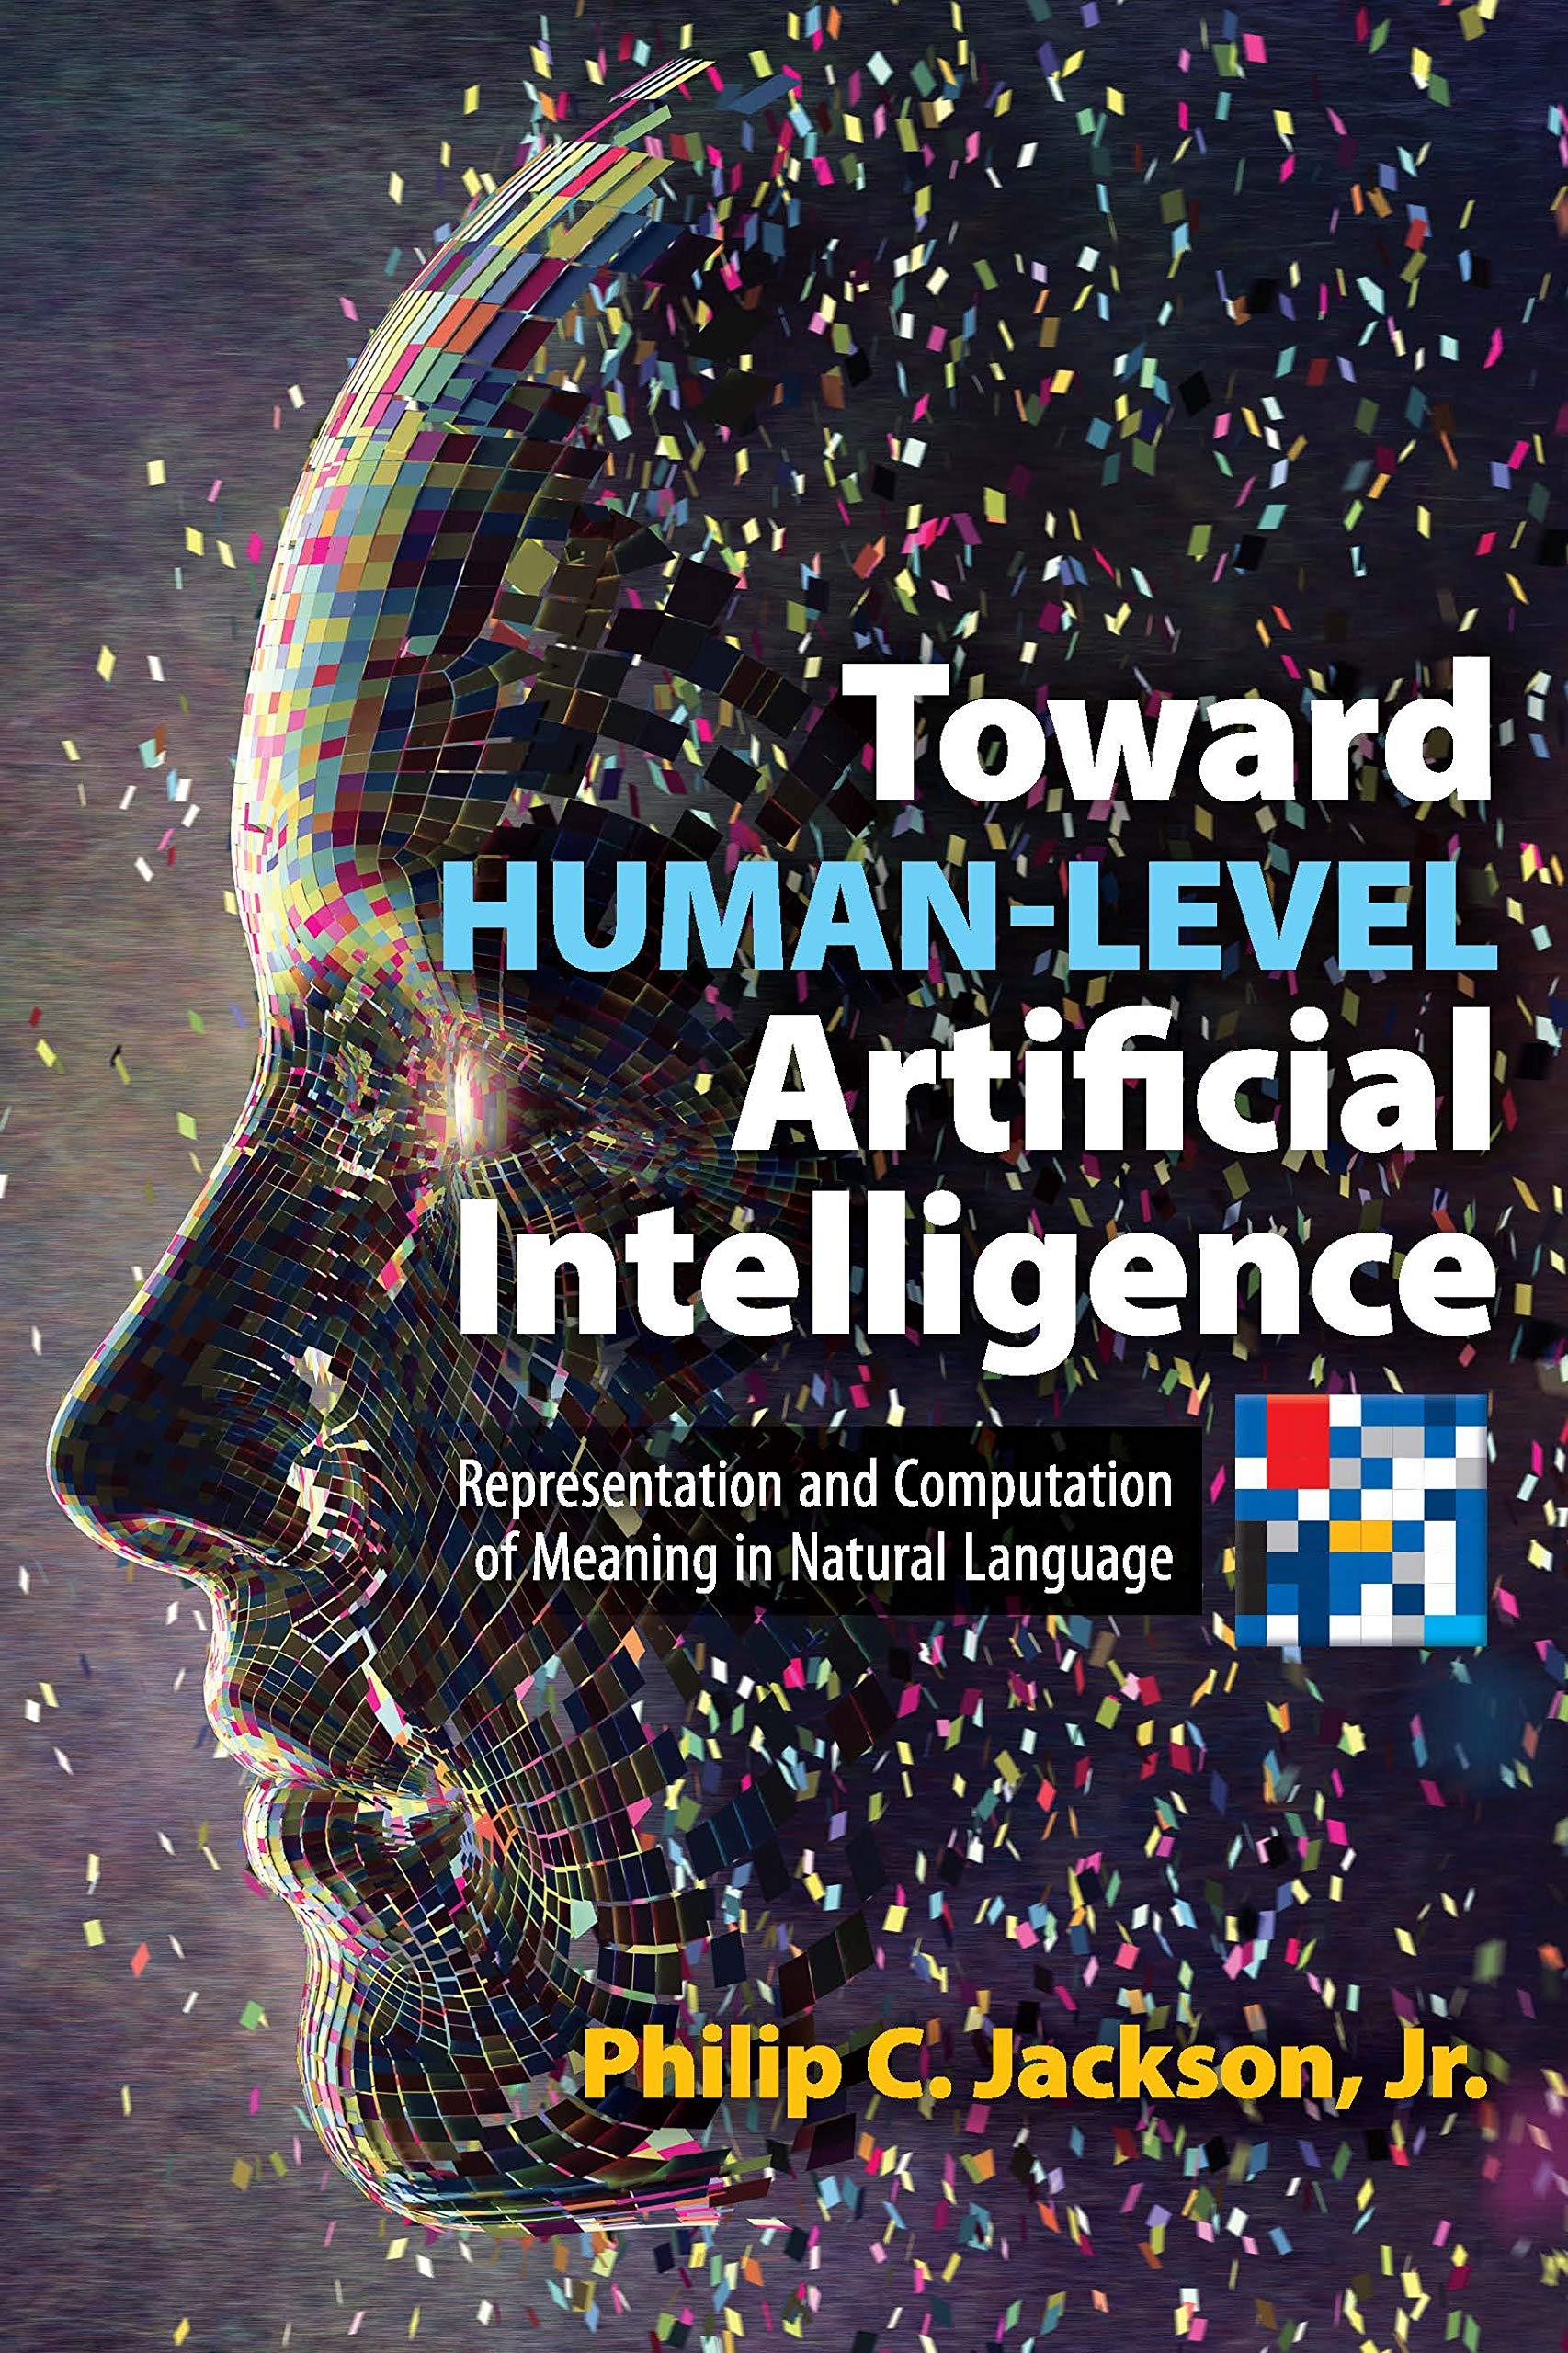 Toward Human-Level Artificial Intelligence (Dover Books on Mathematics)